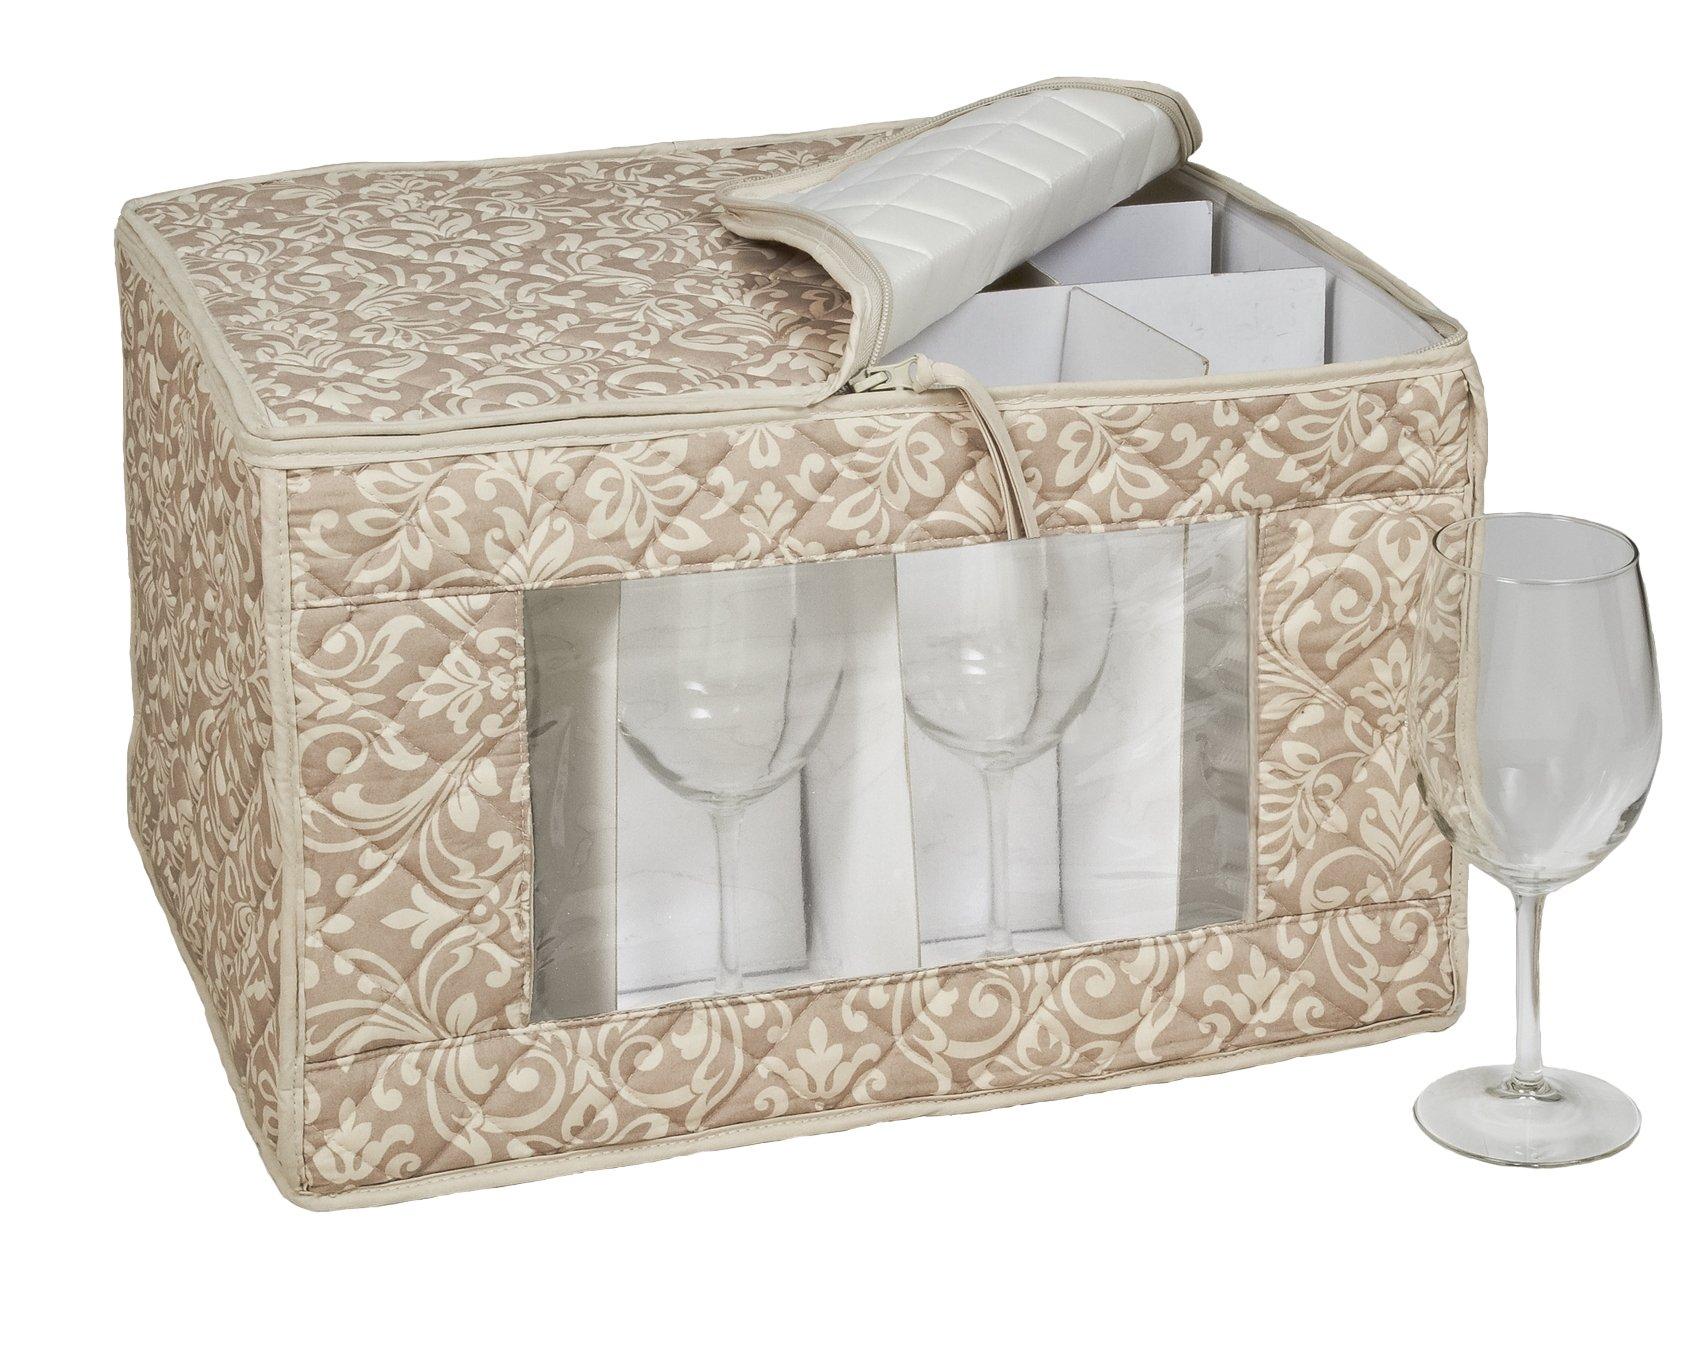 Homewear HUDSON DAMASK Tan Goblet Stemware Storage for 12 Glasses, 13 by 16.5 by 10.5-Inch